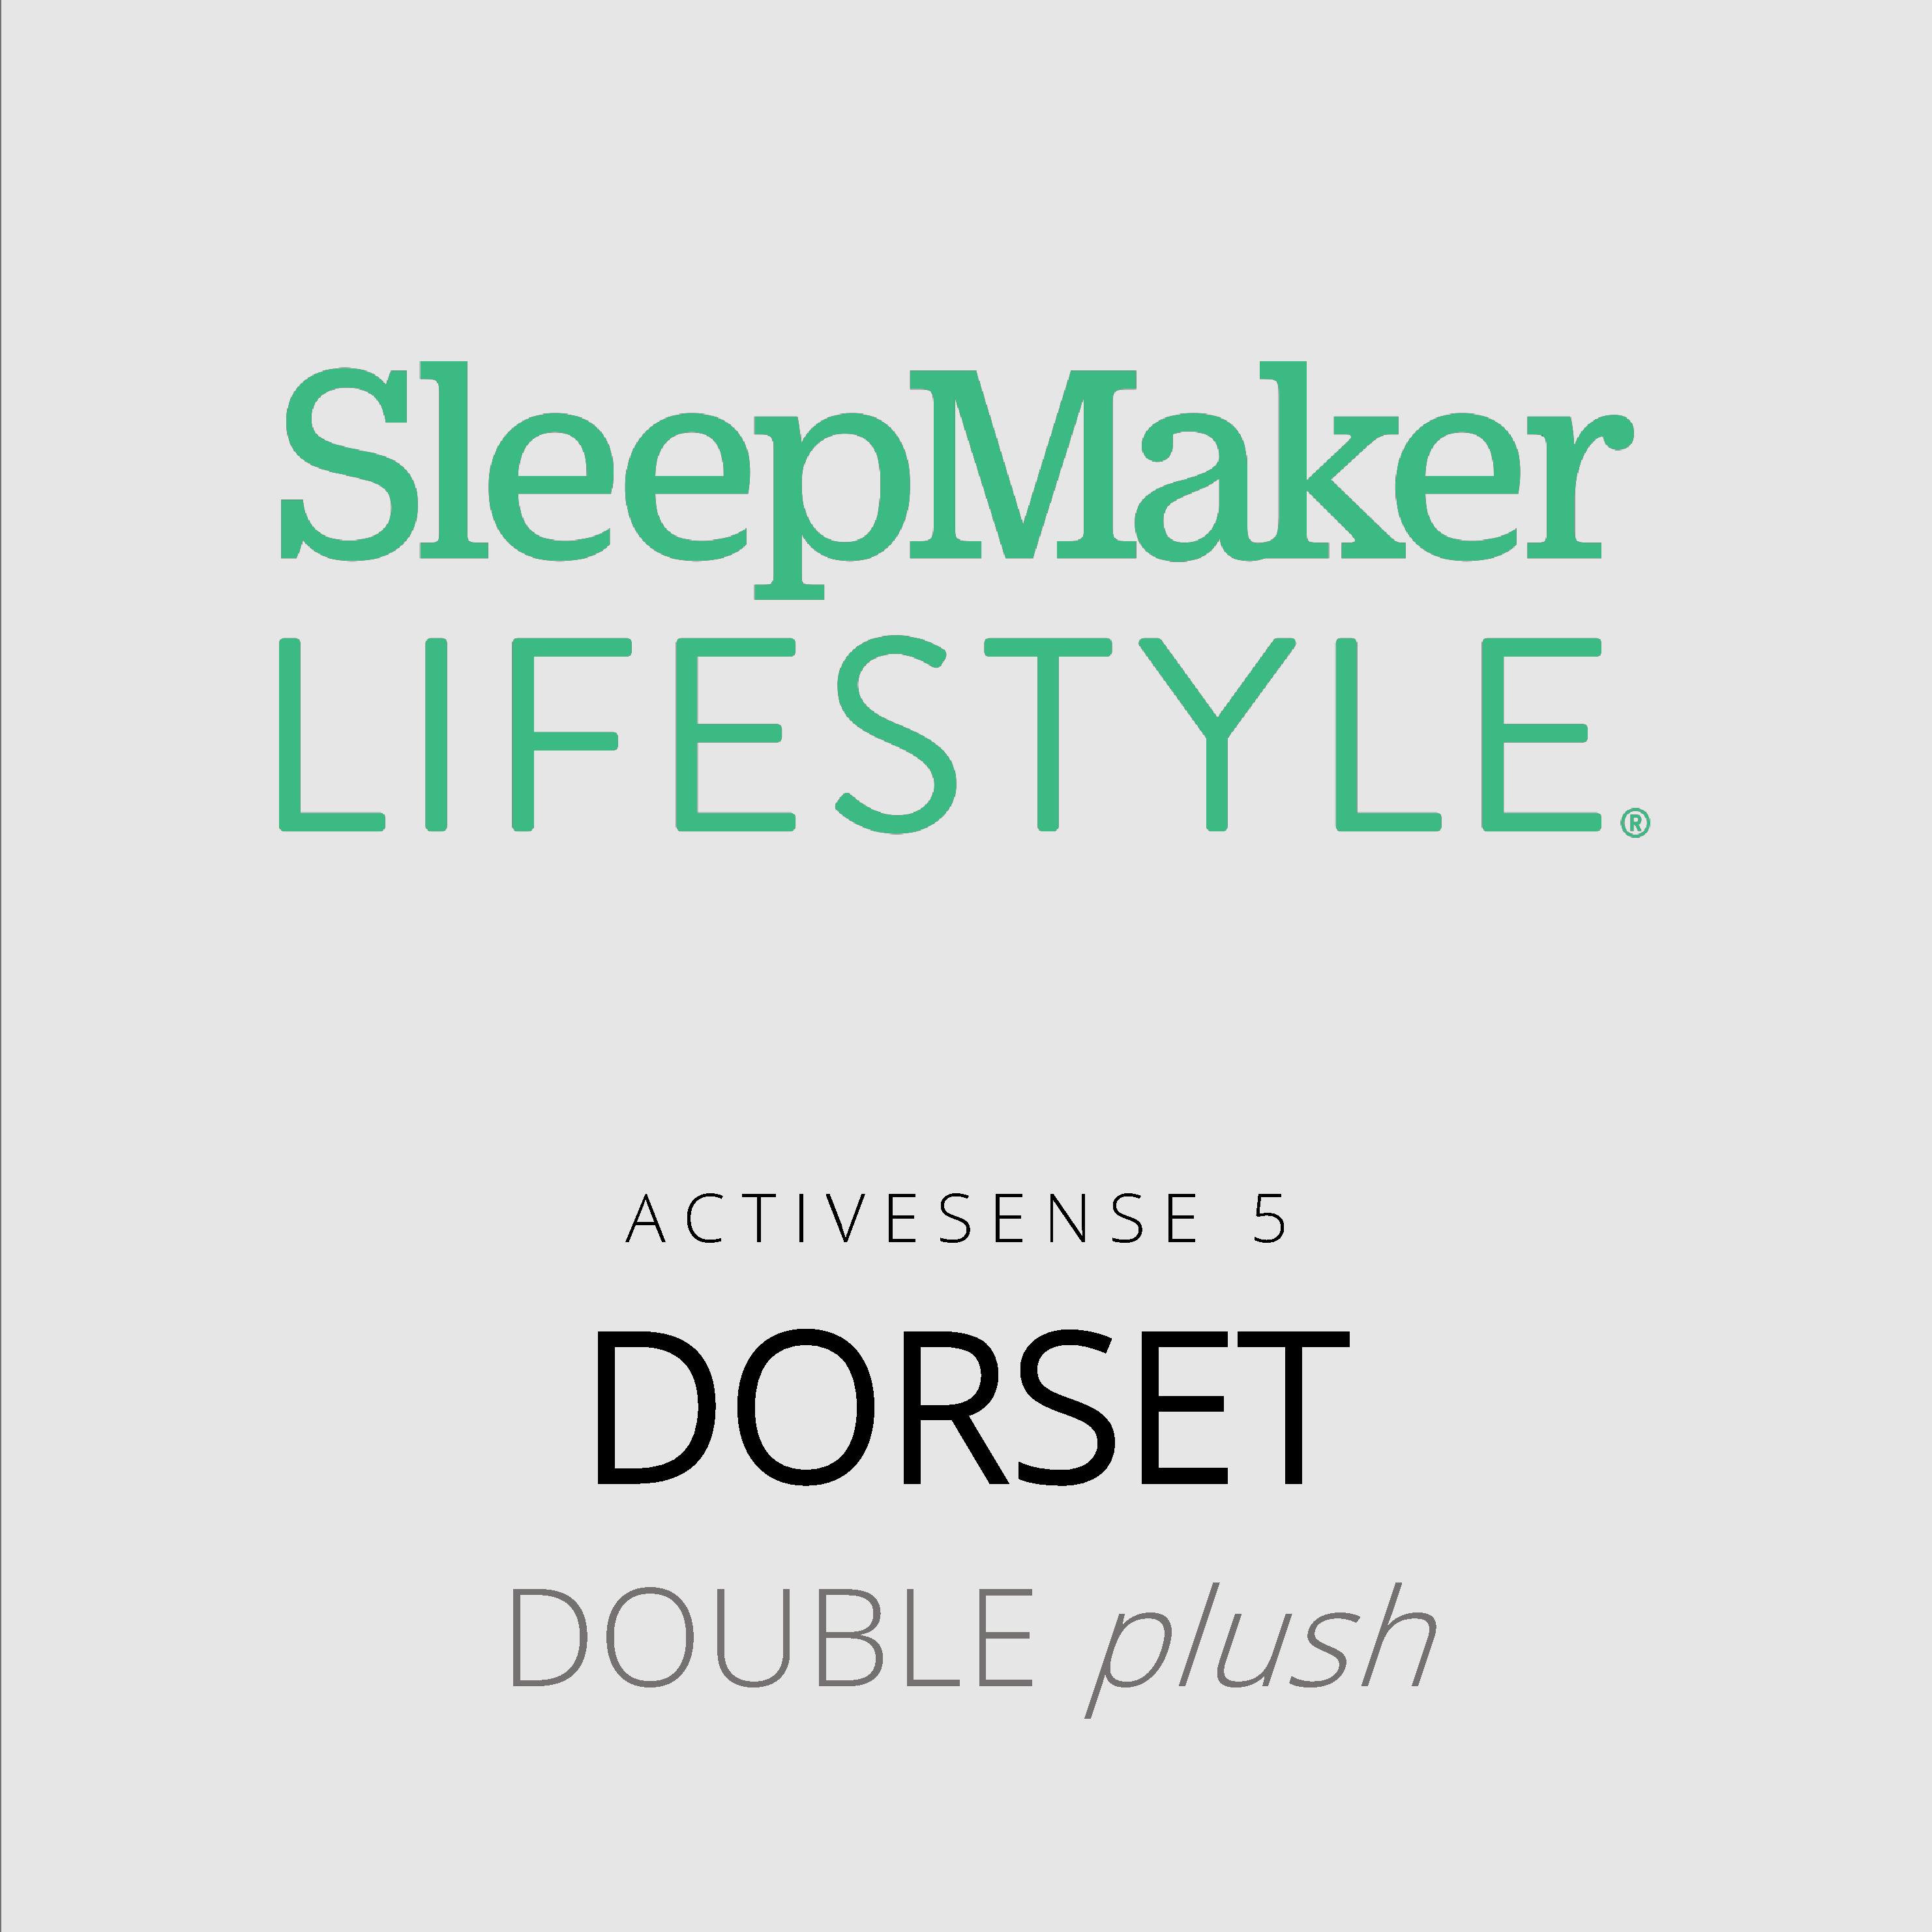 SleepMaker Lifestyle – Dorset – ActiveSense 5 – Double Plush Mattress